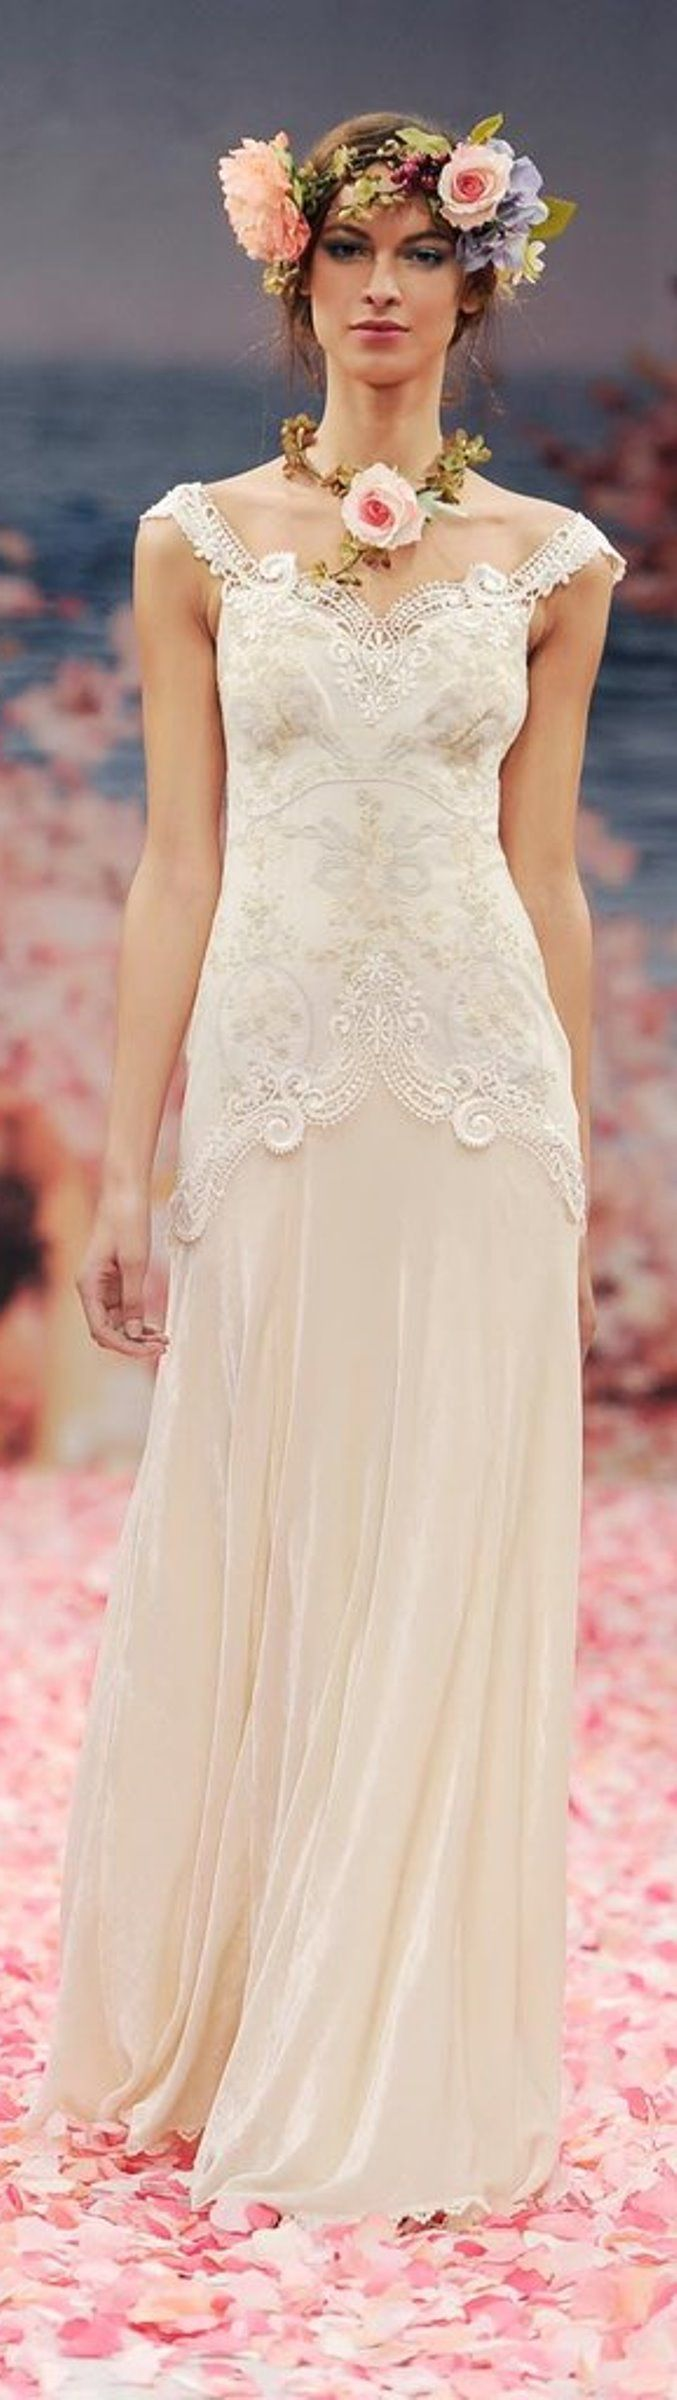 55 best images about SAMPLE SALE Wedding Dresses on Pinterest